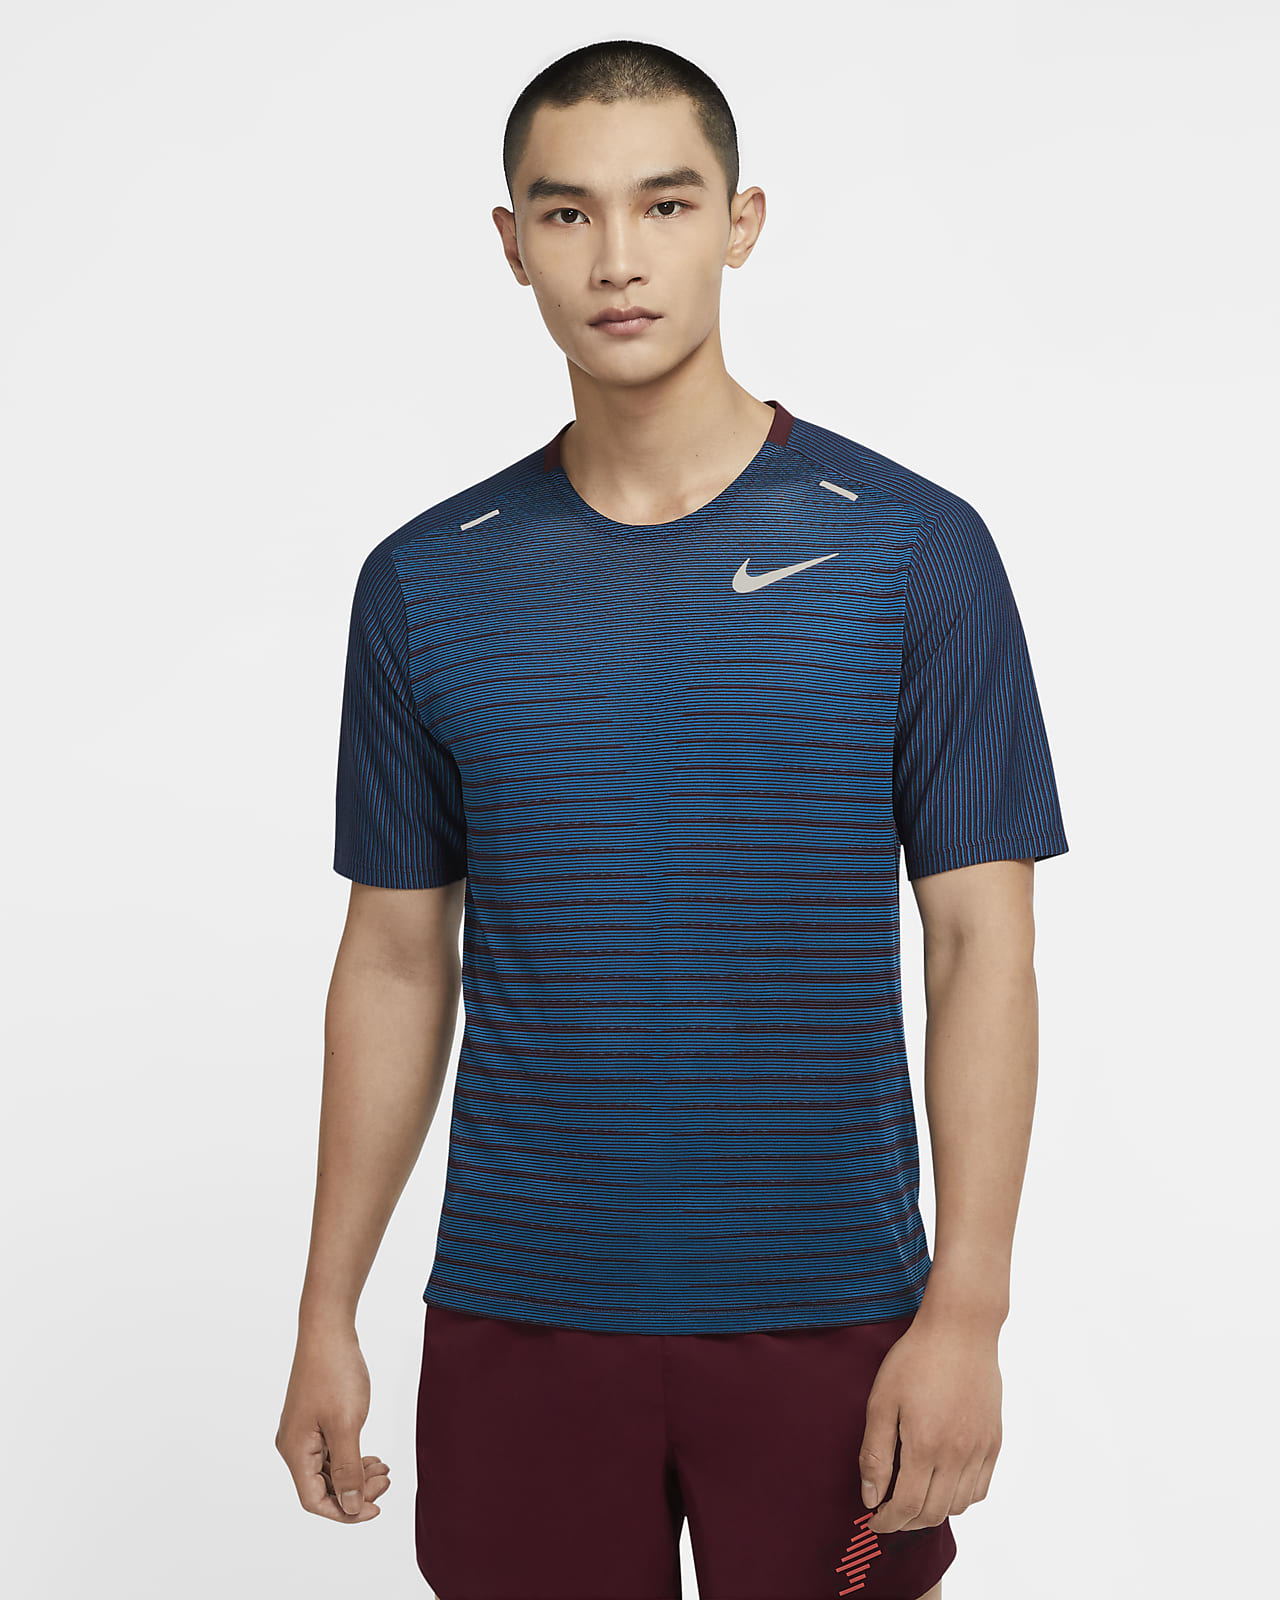 Męska koszulka do biegania Nike TechKnit Future Fast